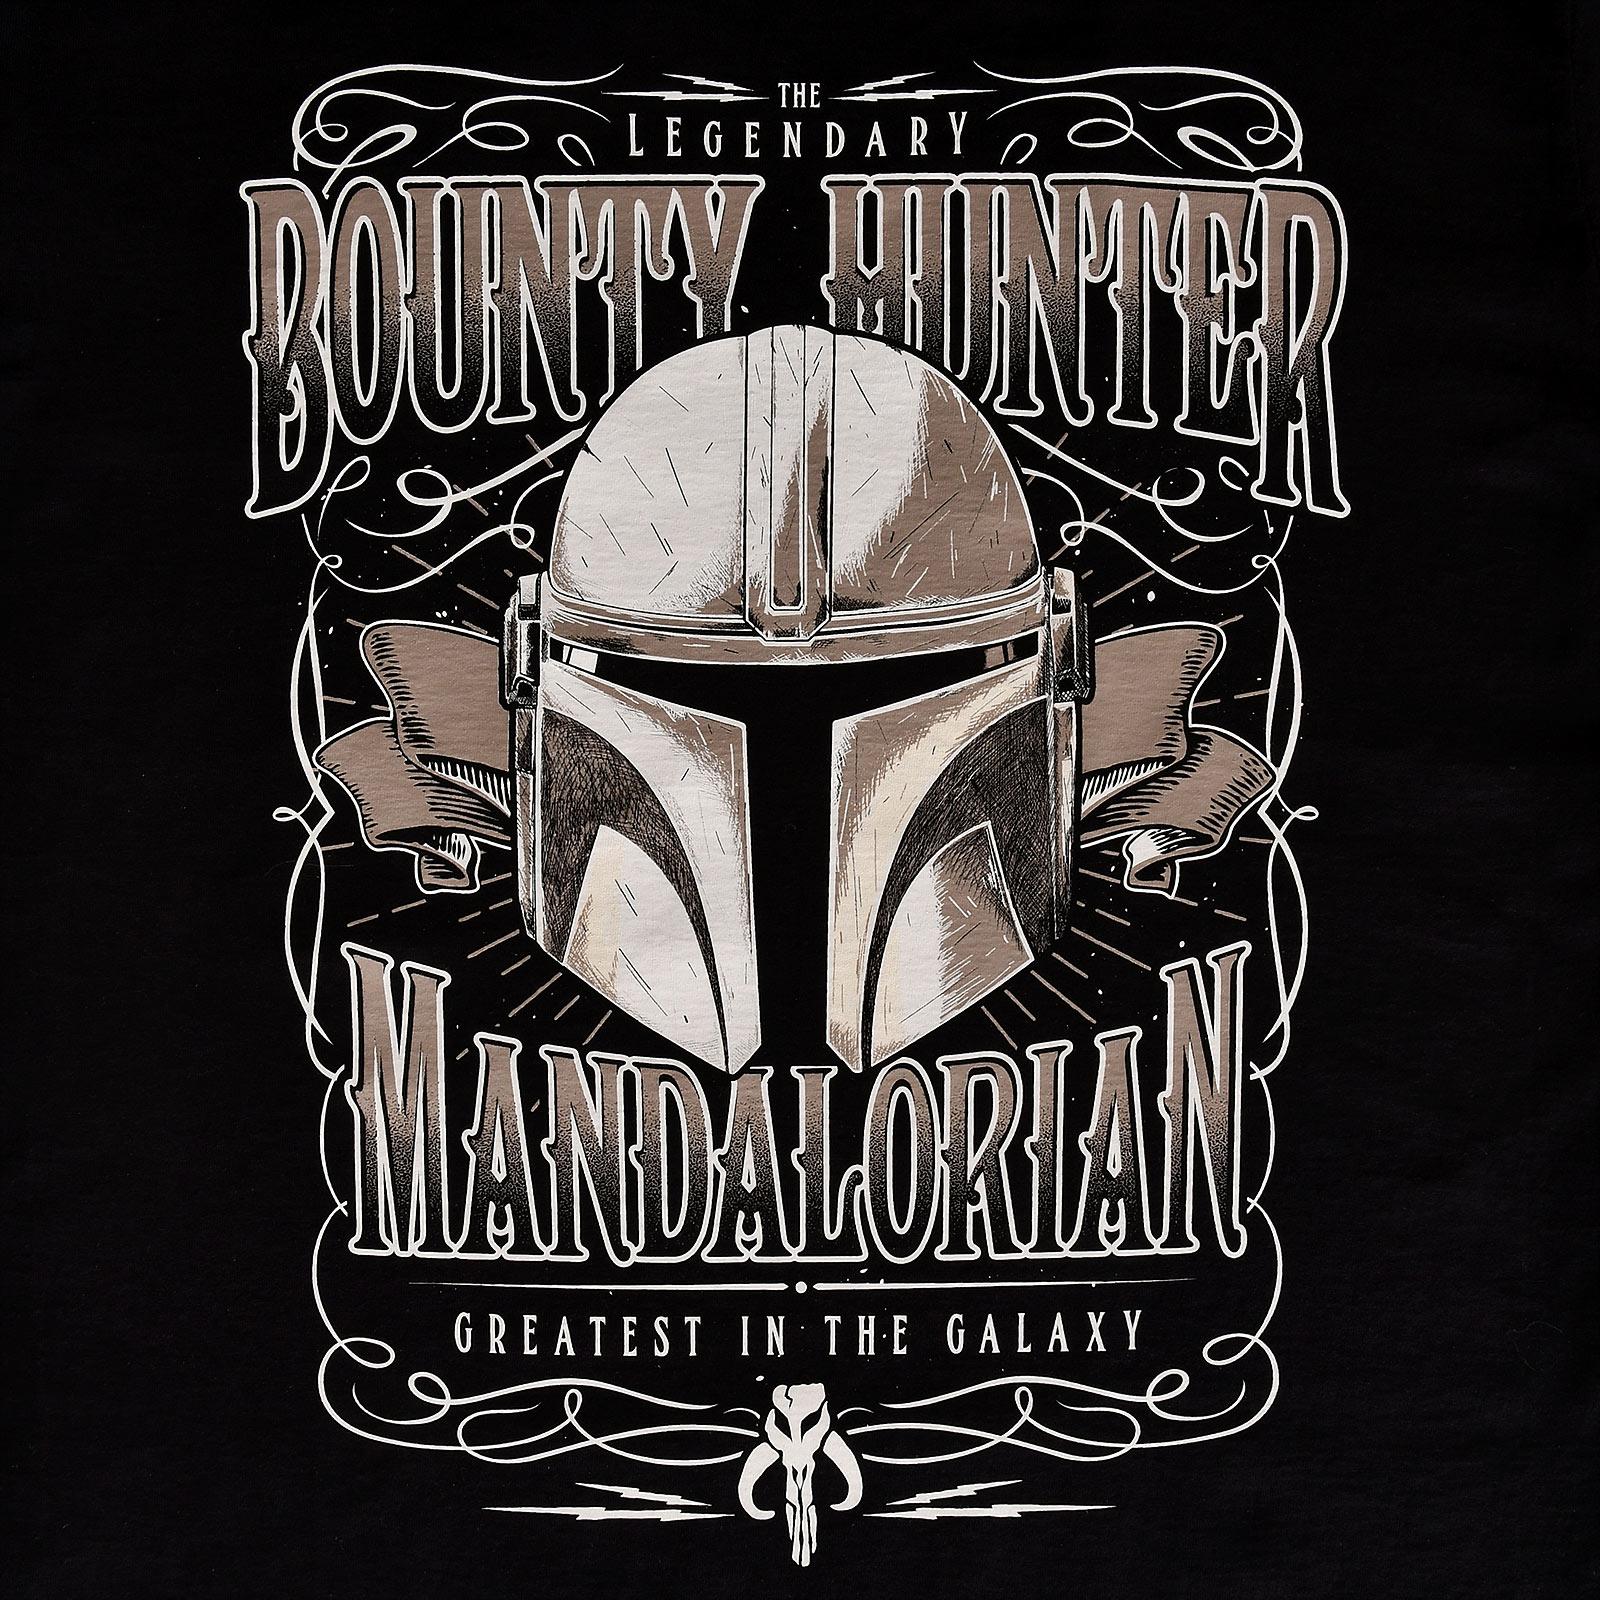 Greatest in the Galaxy T-Shirt schwarz - Star Wars The Mandalorian